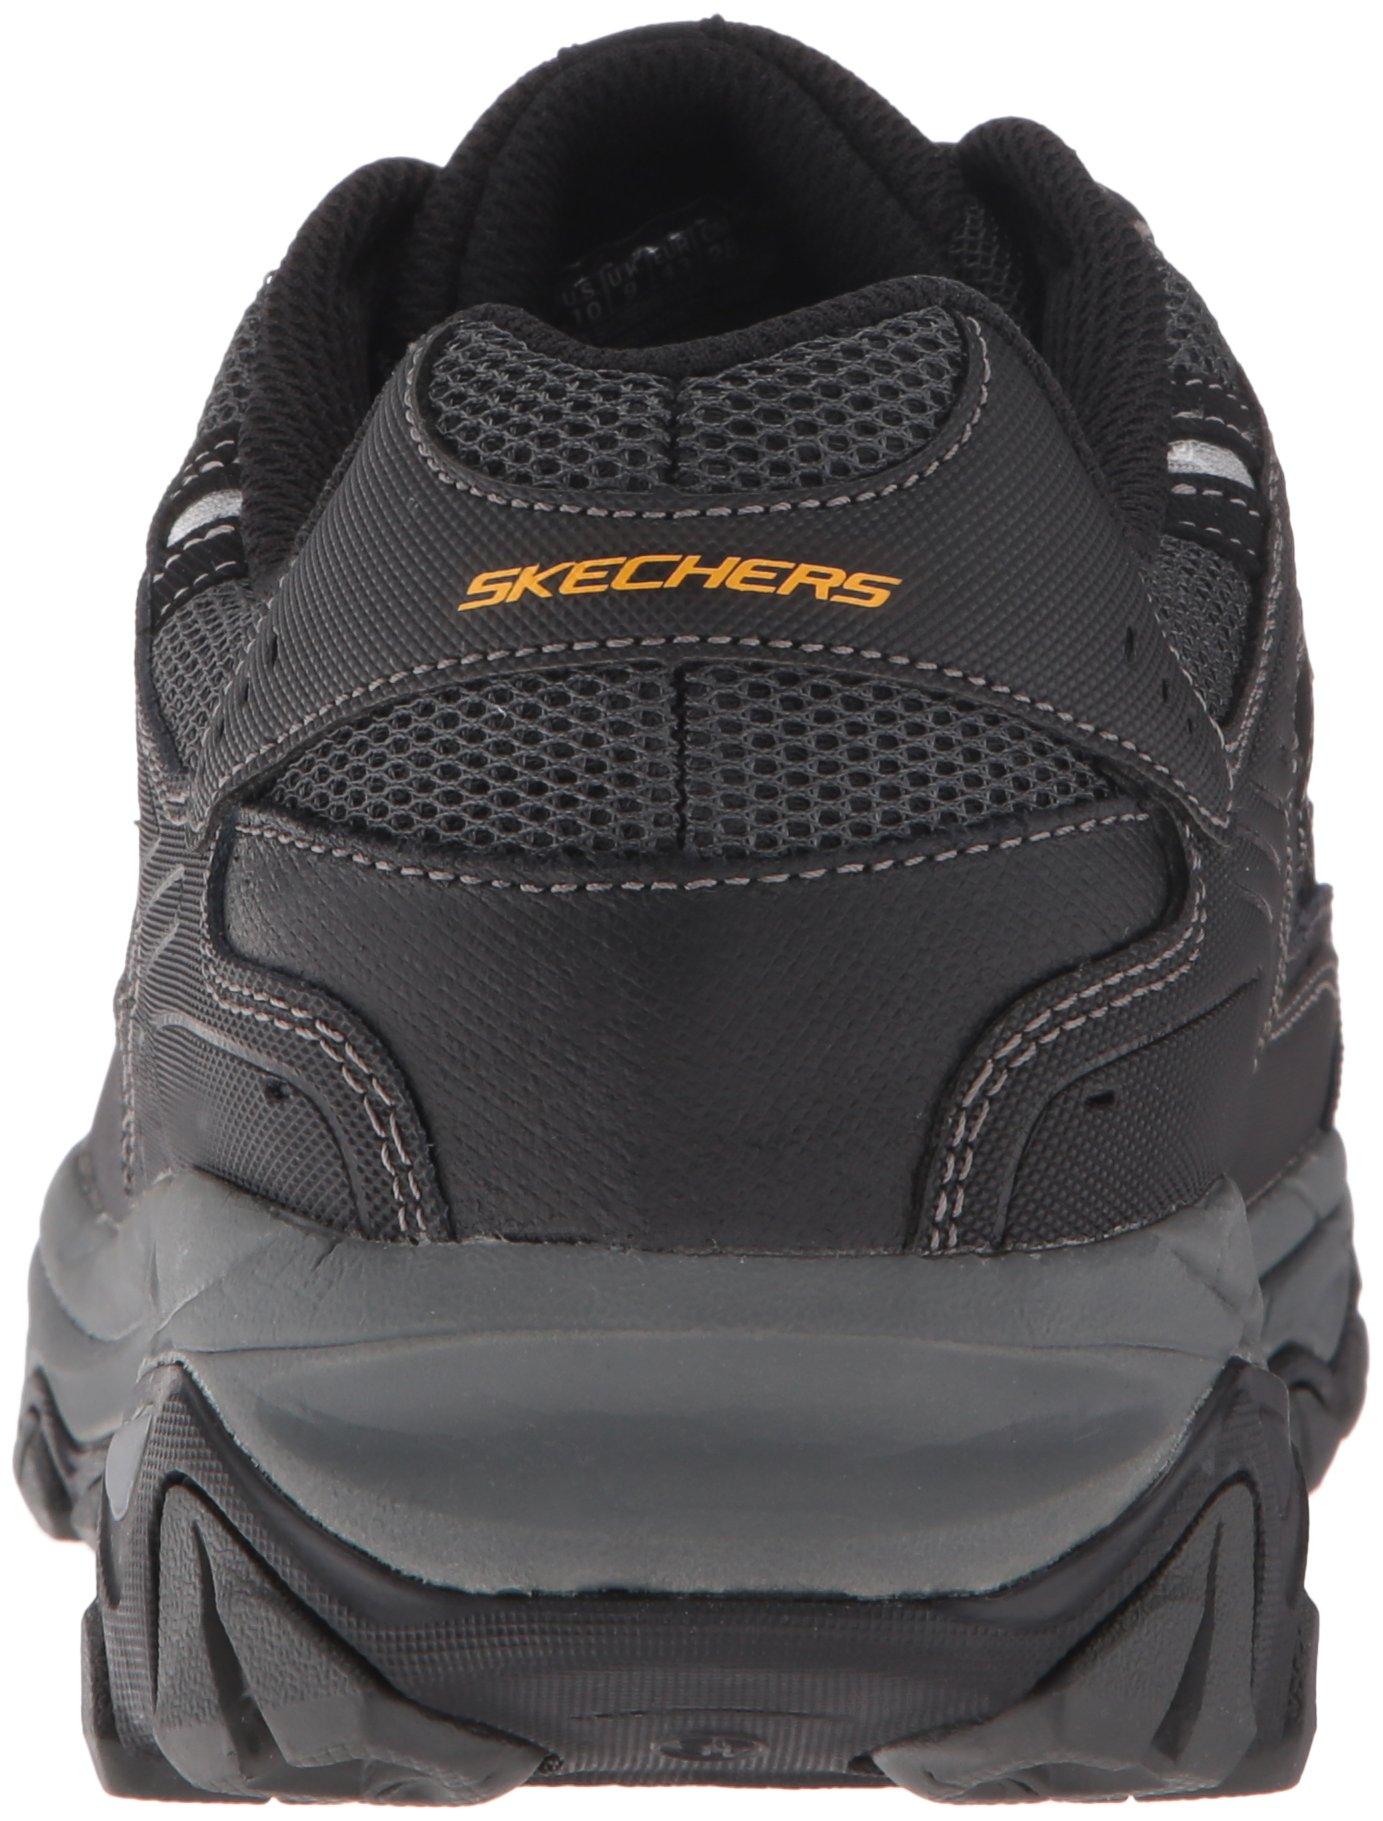 Skechers Men's AFTERBURNM.FIT Memory Foam Lace-Up Sneaker, Black, 6.5 M US by Skechers (Image #2)